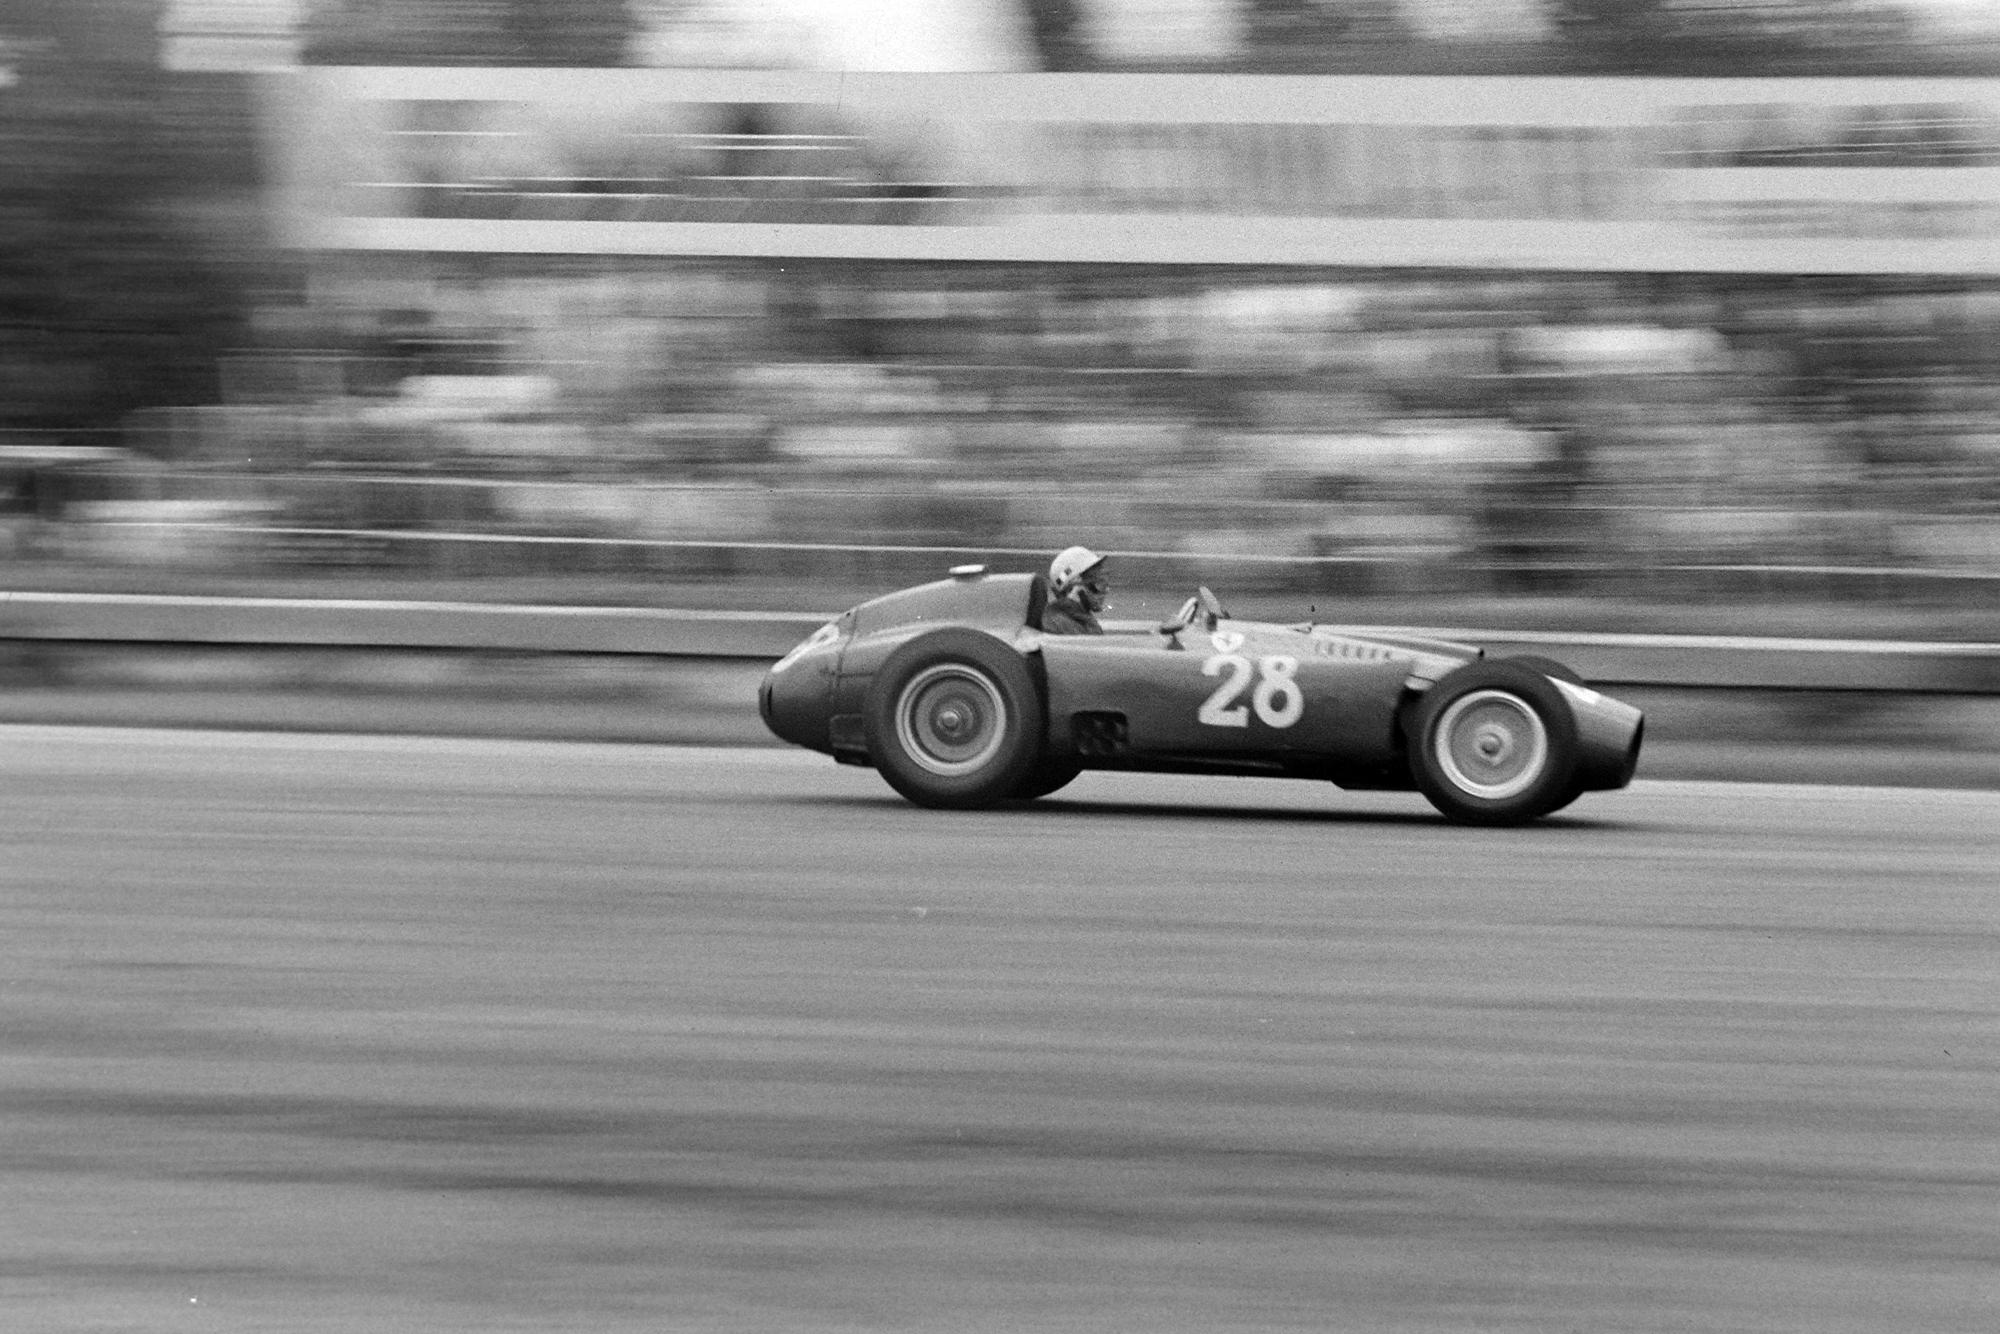 Luigi Musso in his Ferrari/Lancia D50 at the 1956 Italian Grand Prix, Monza